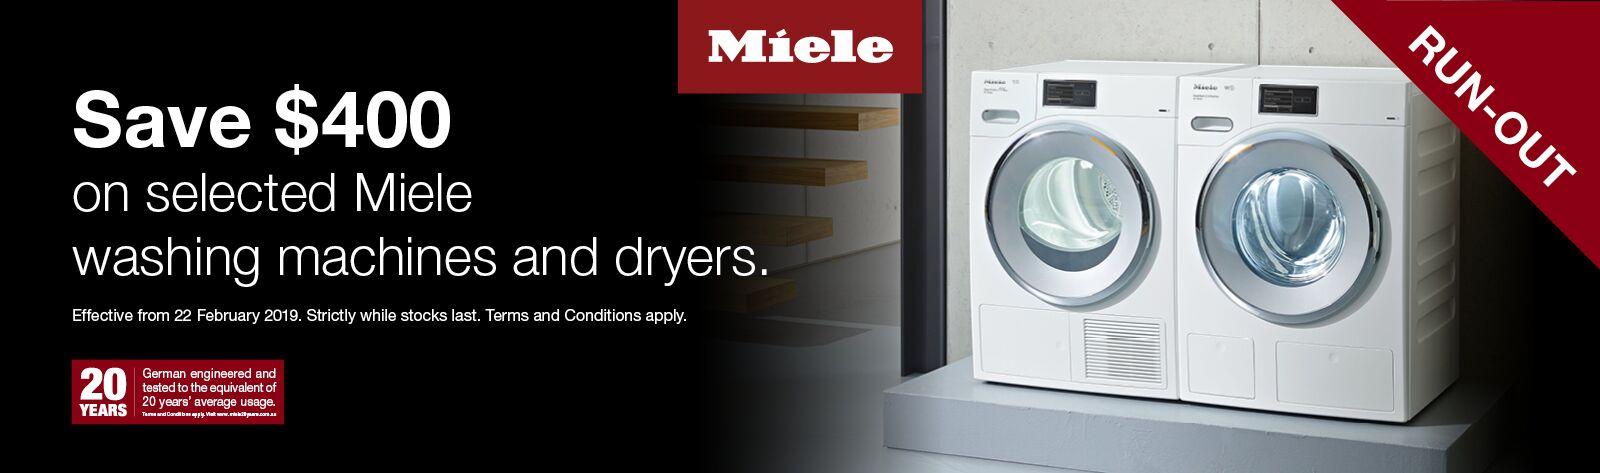 miele-laundry-run-out-promo.jpeg